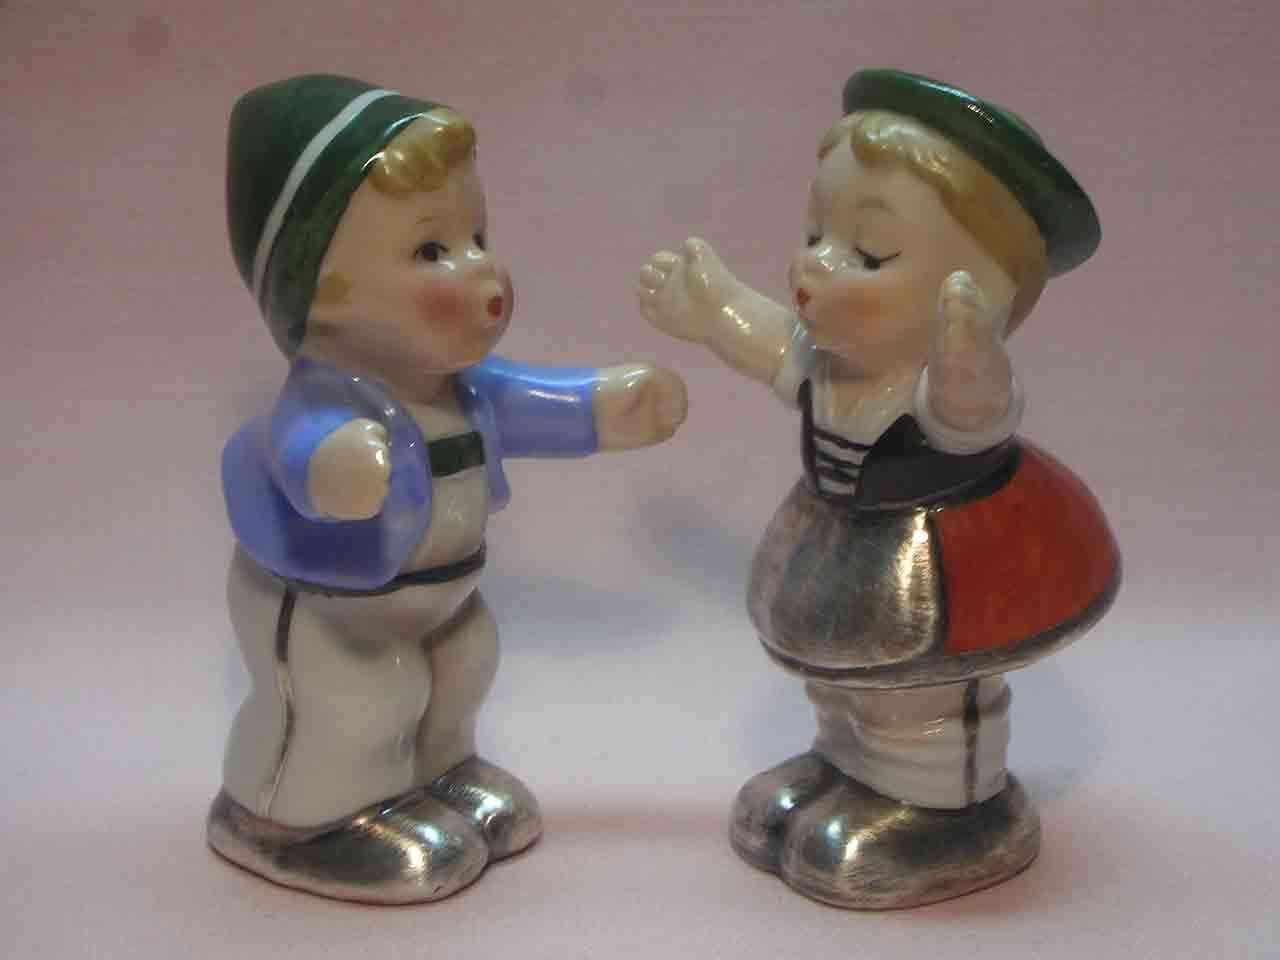 Goebel huggers salt and pepper shakers - Tyrolean